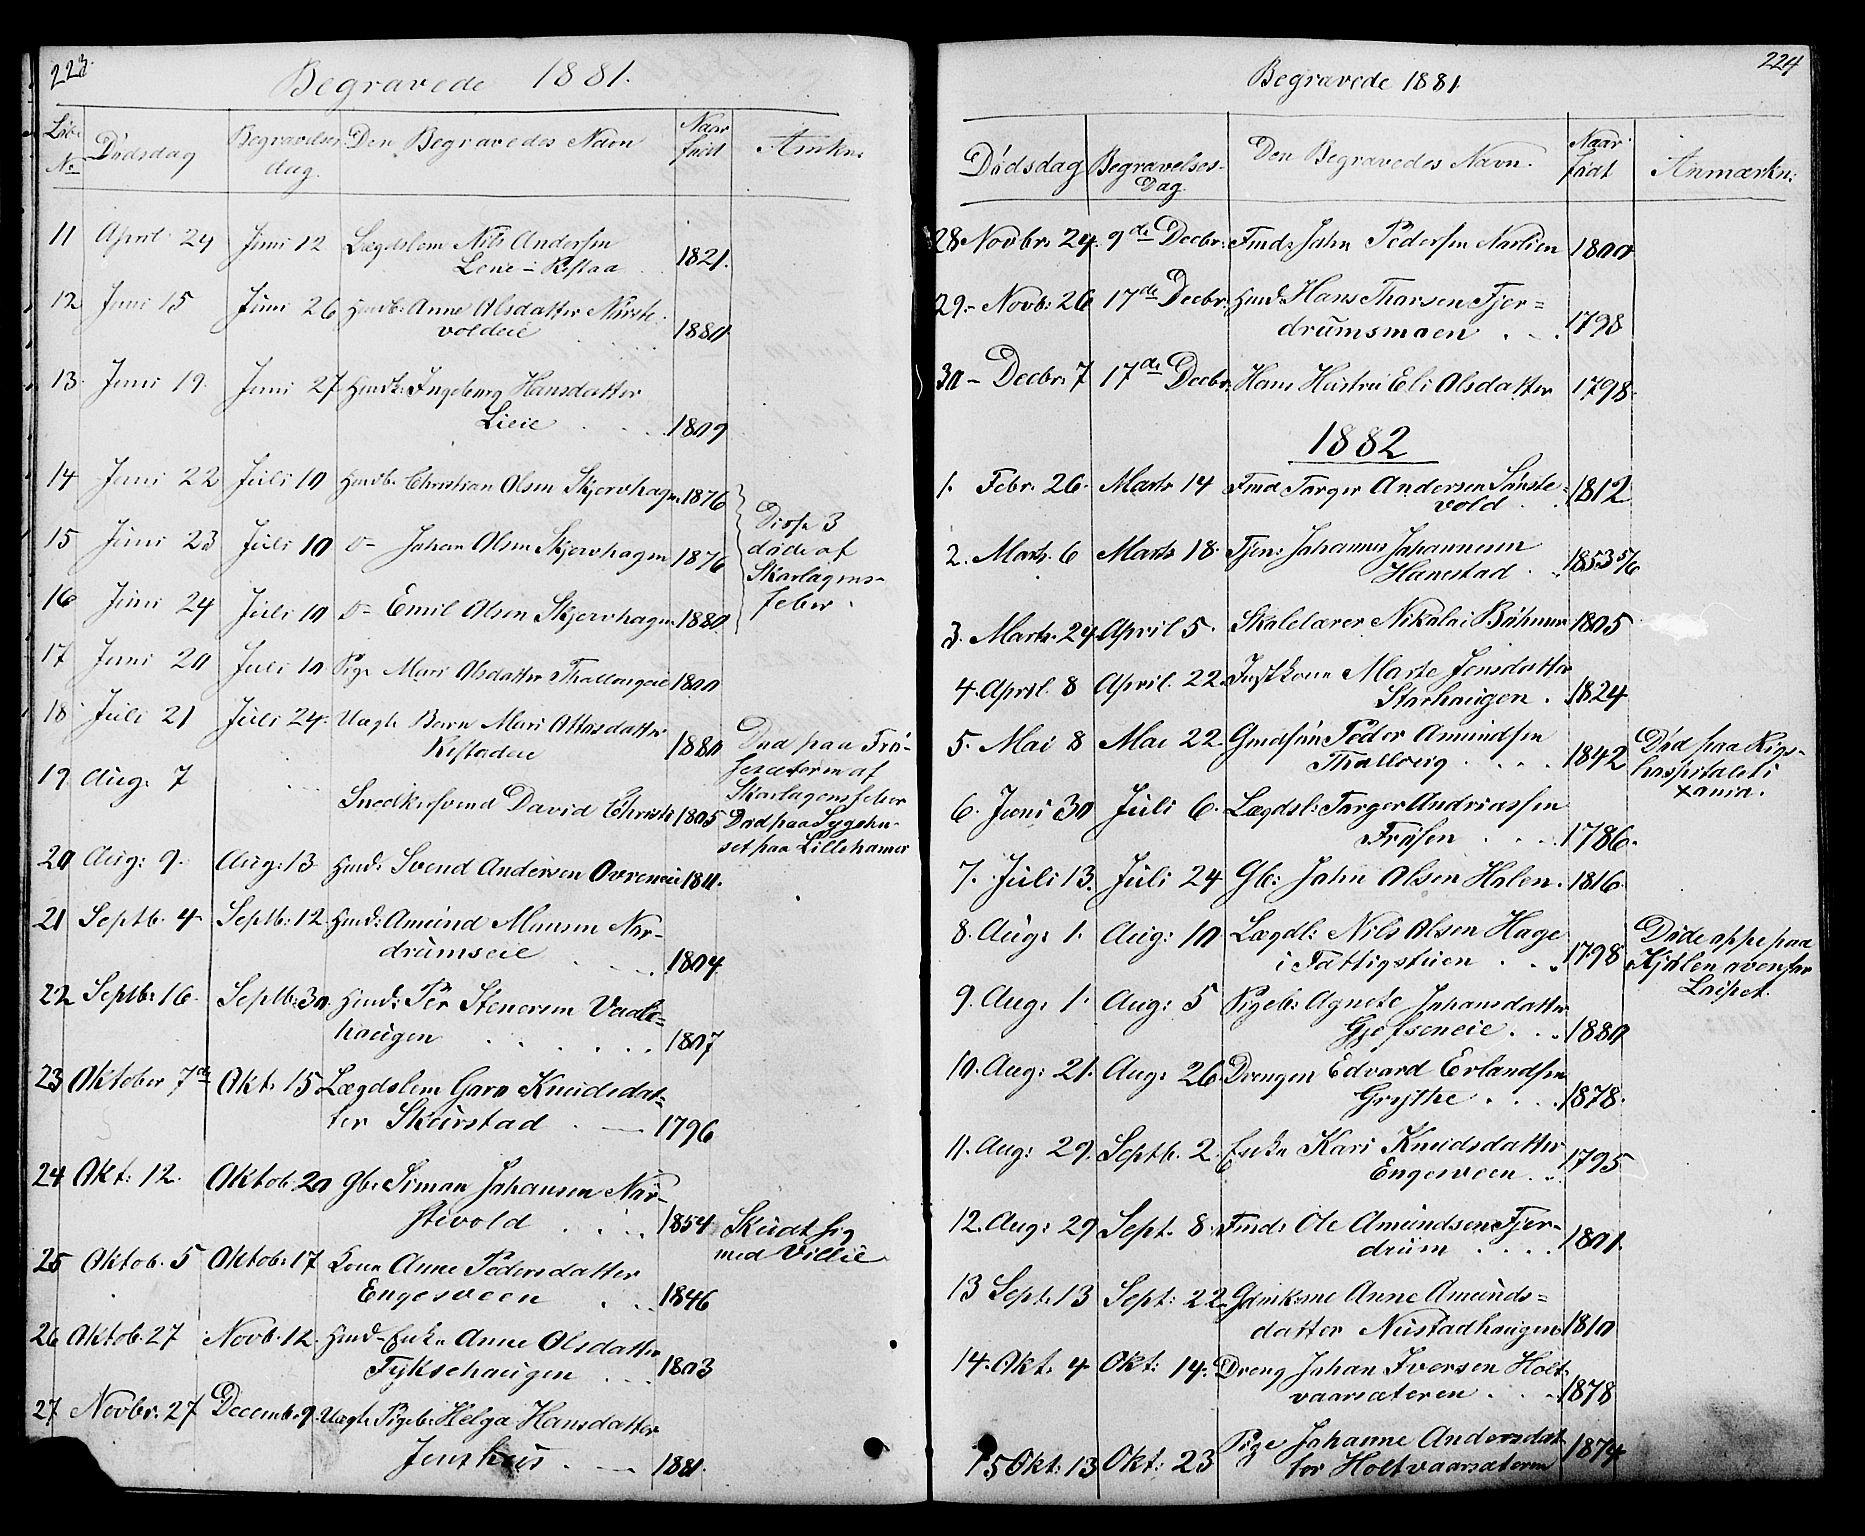 SAH, Østre Gausdal prestekontor, Klokkerbok nr. 1, 1863-1893, s. 223-224